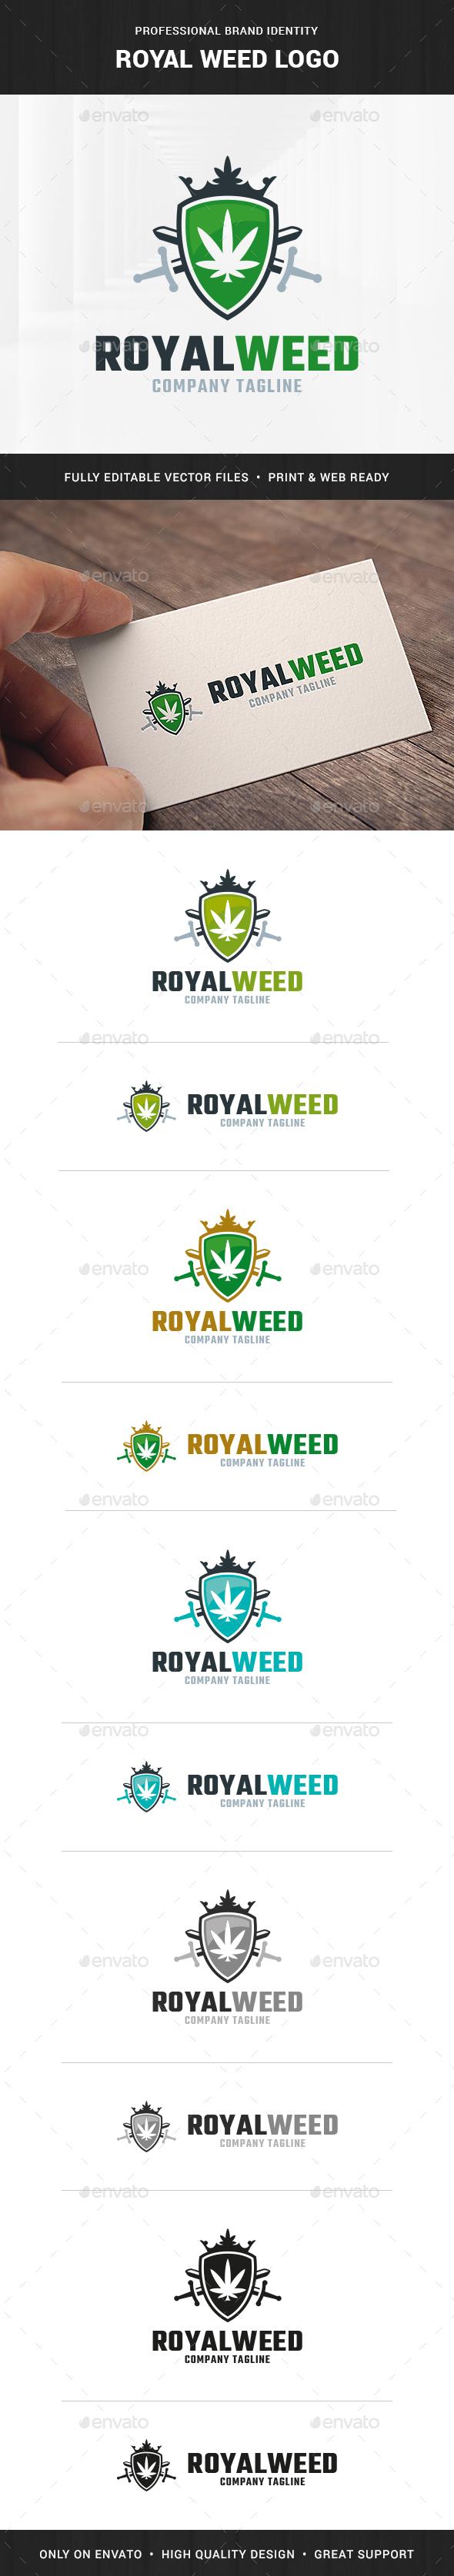 Royal Weed Logo Template